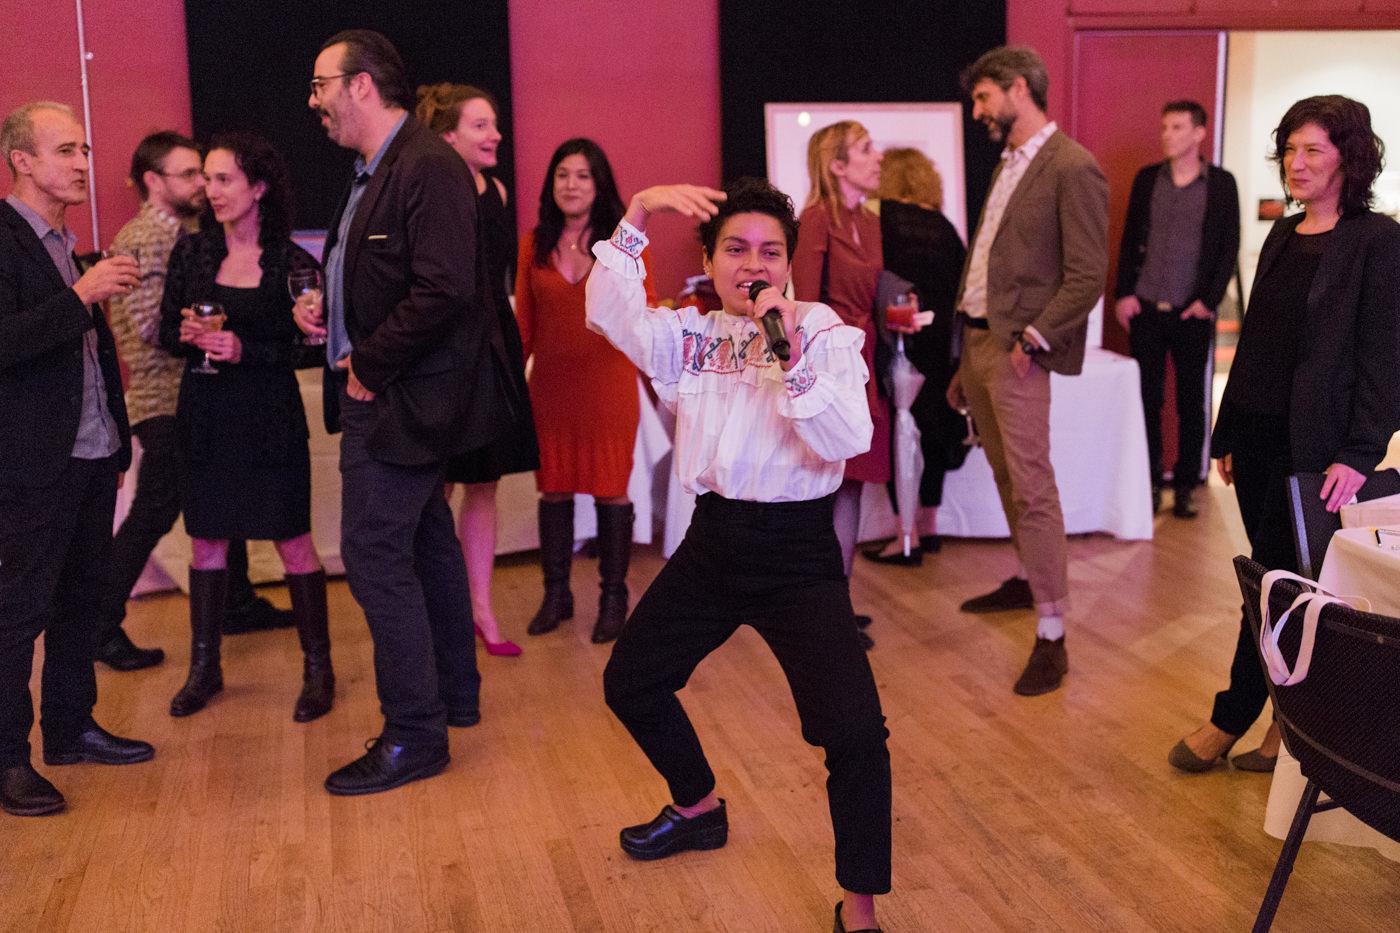 Mt Tremper Arts Gala -  NYC event photographer Kamp Weddings-6.jpg